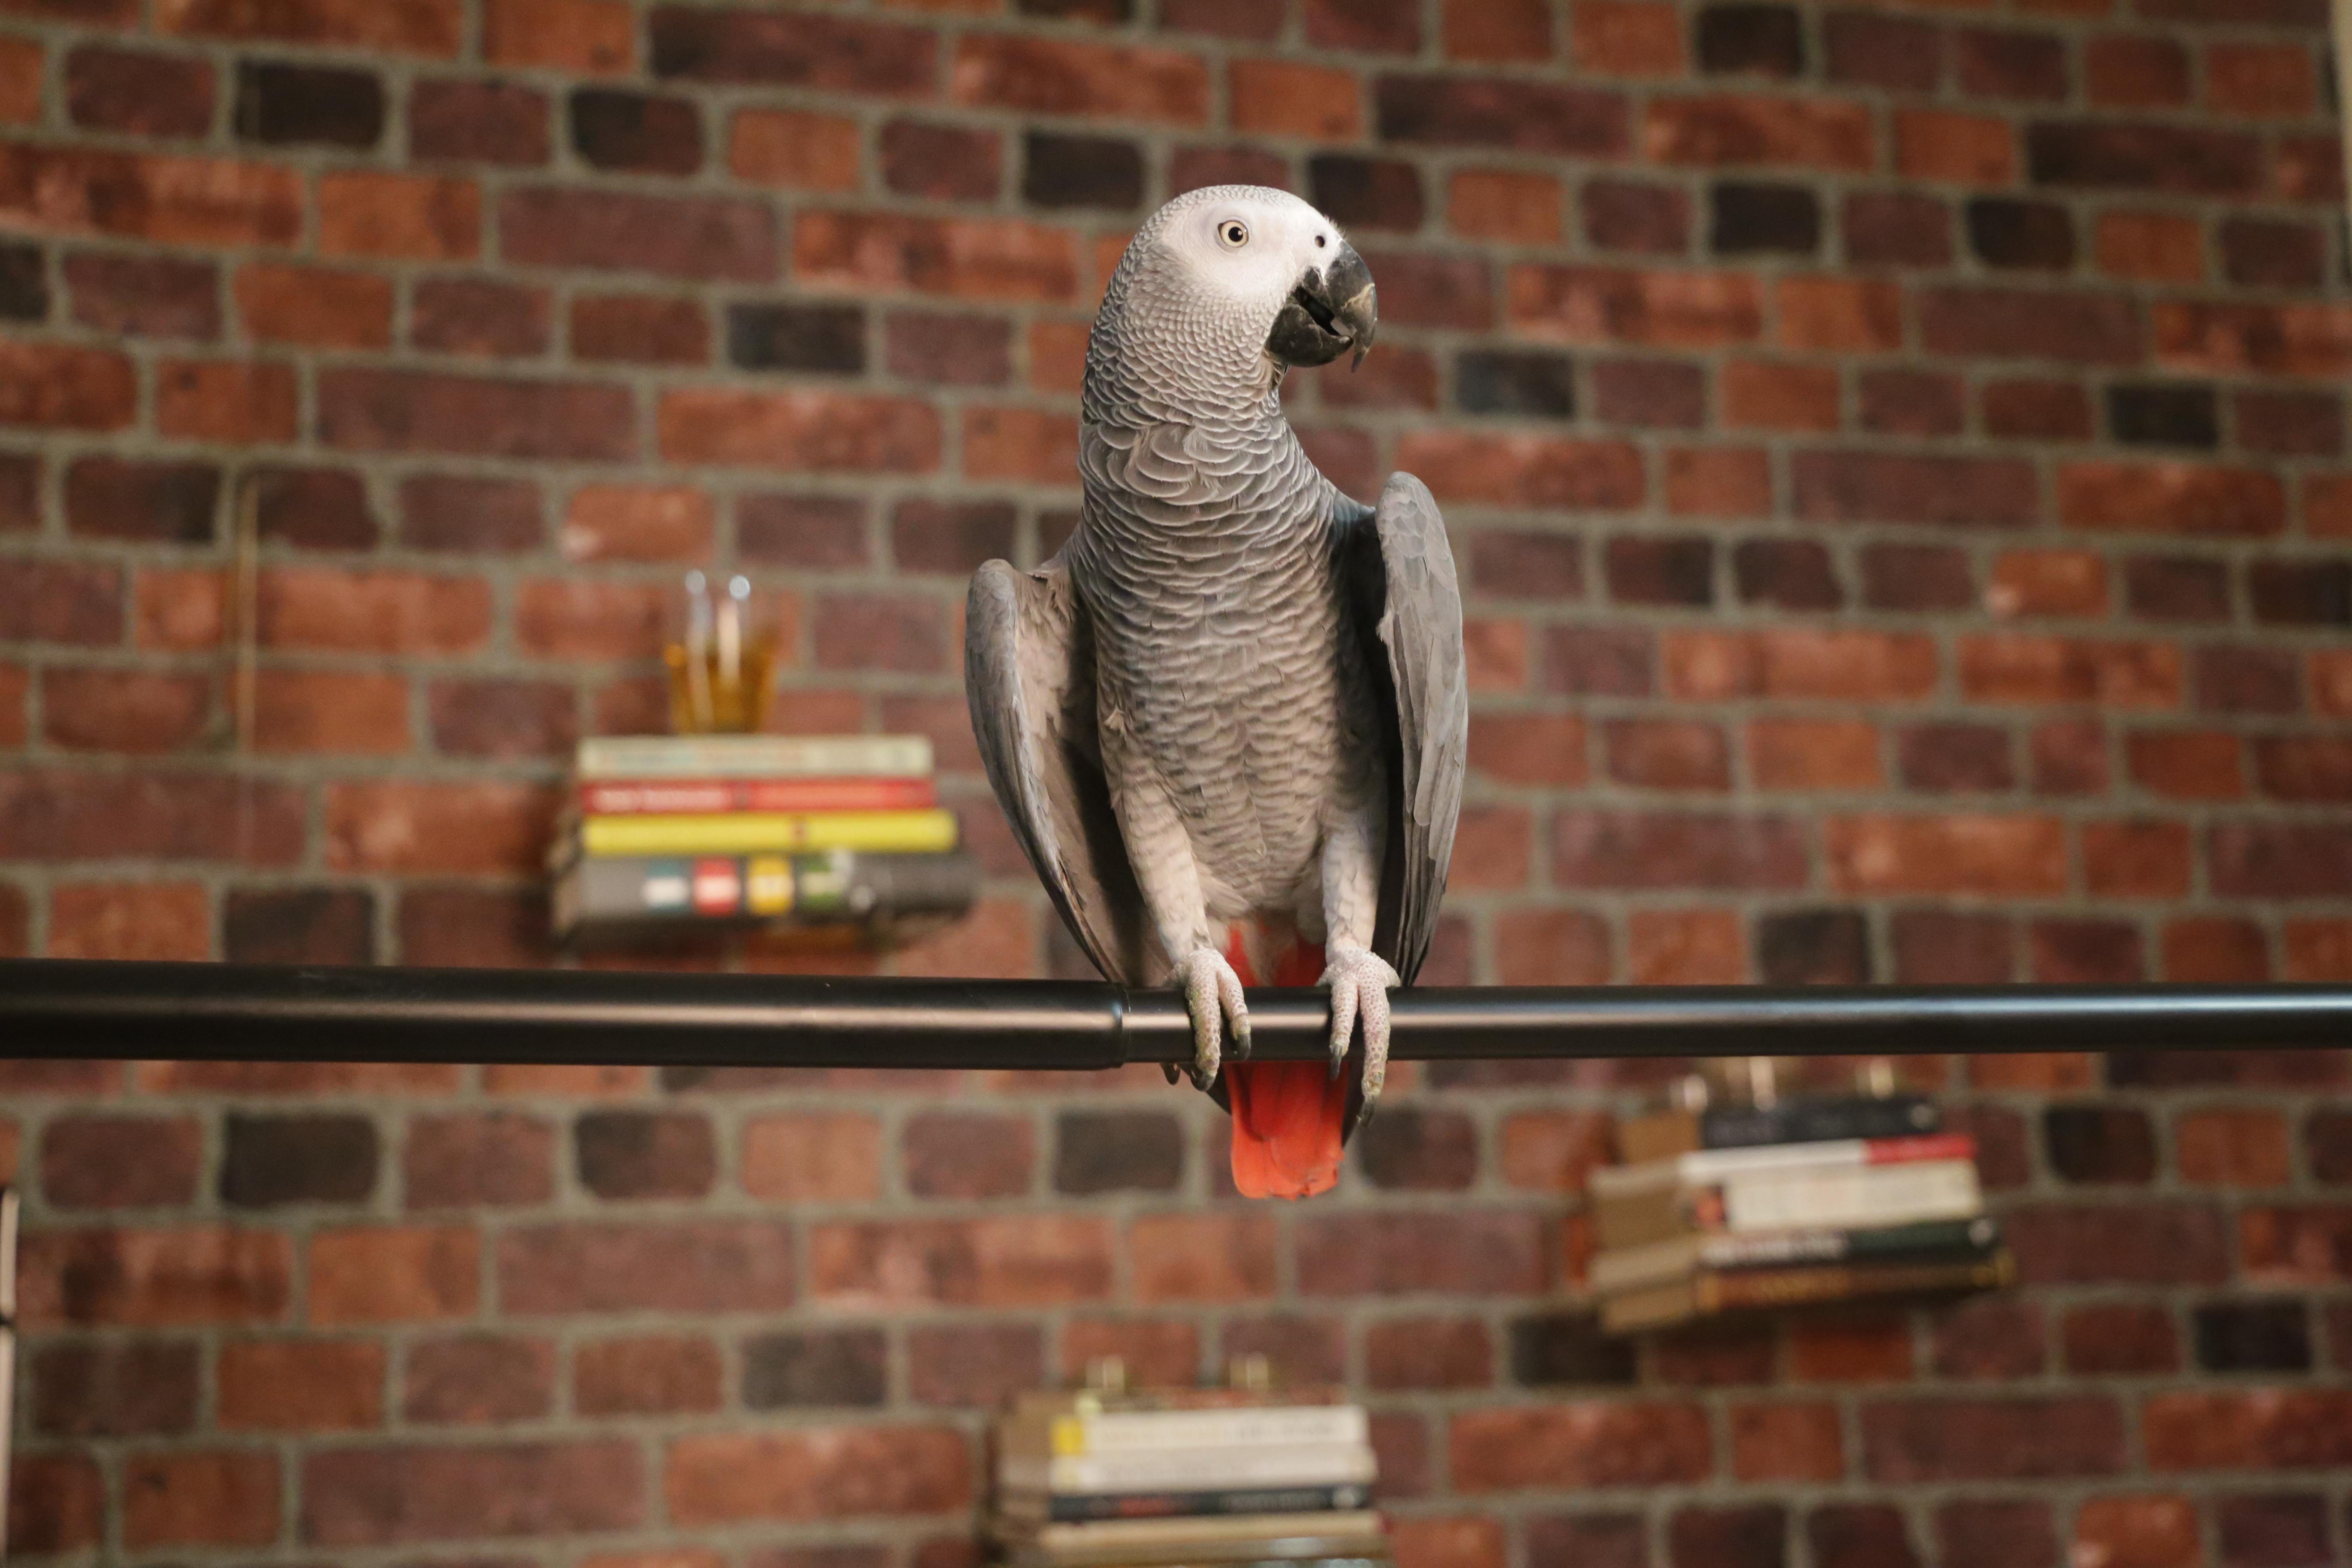 6 social lessons my parrot, Zizu, has taught me